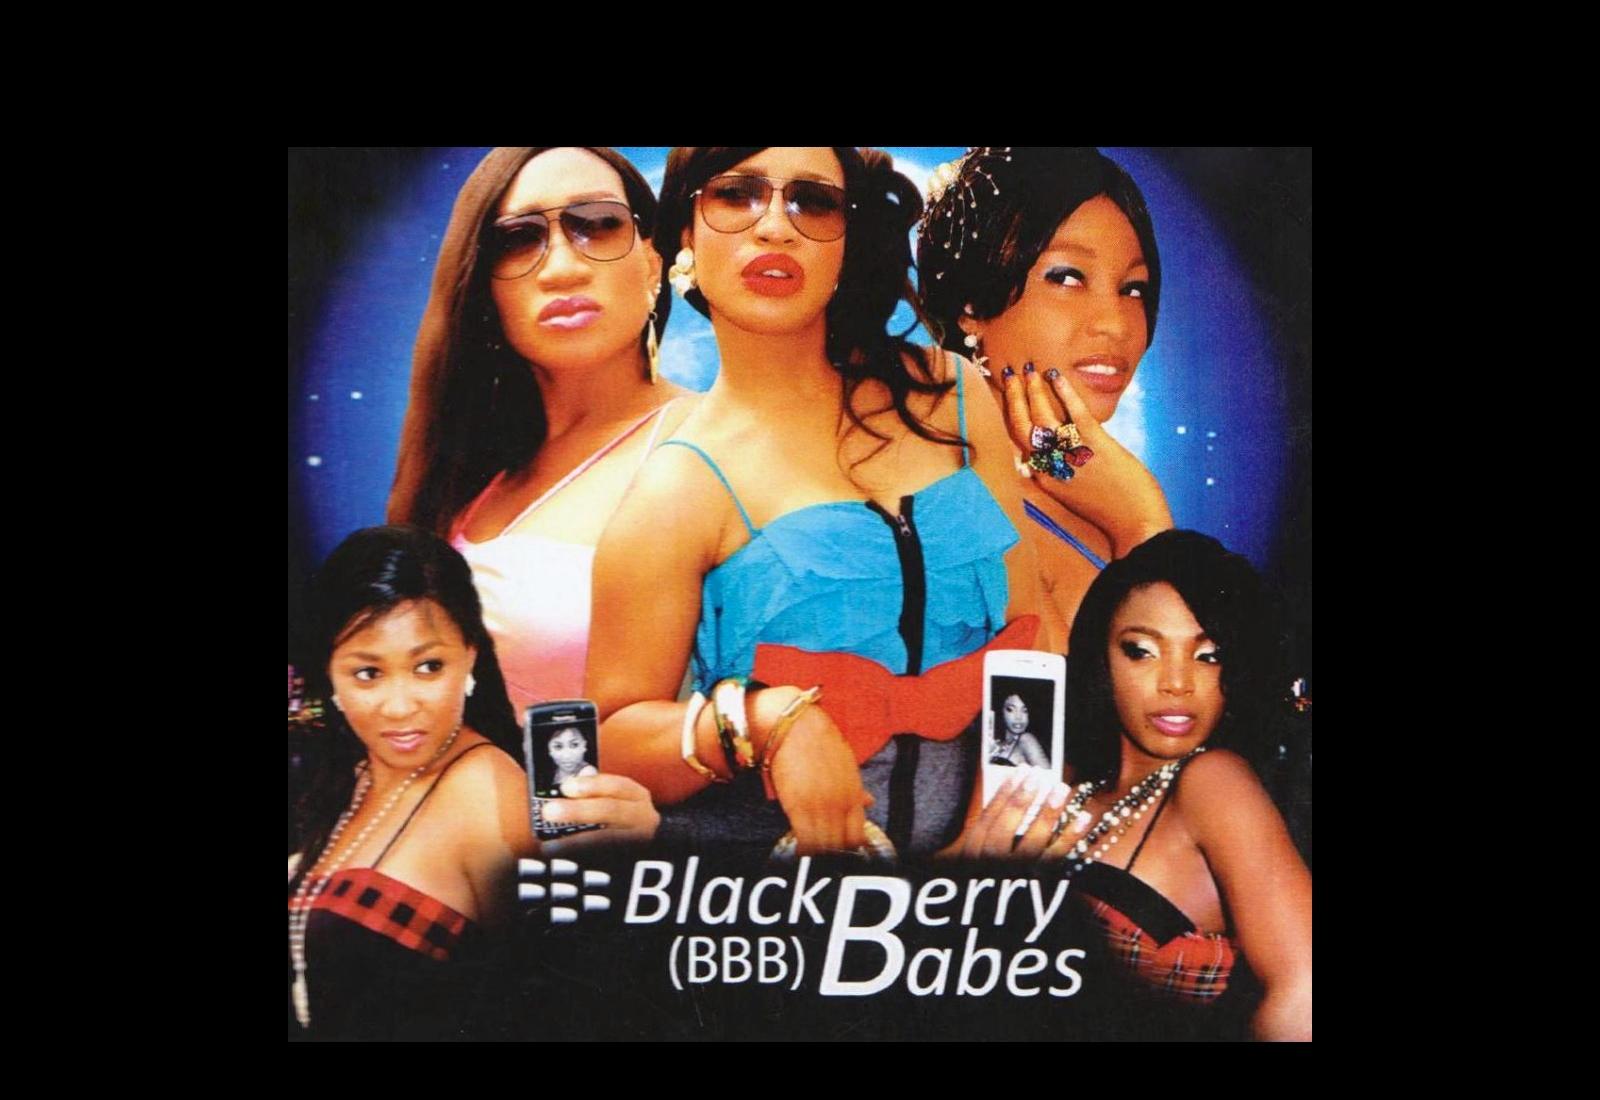 Blackberry Babes - Crédit photo : Cinetion